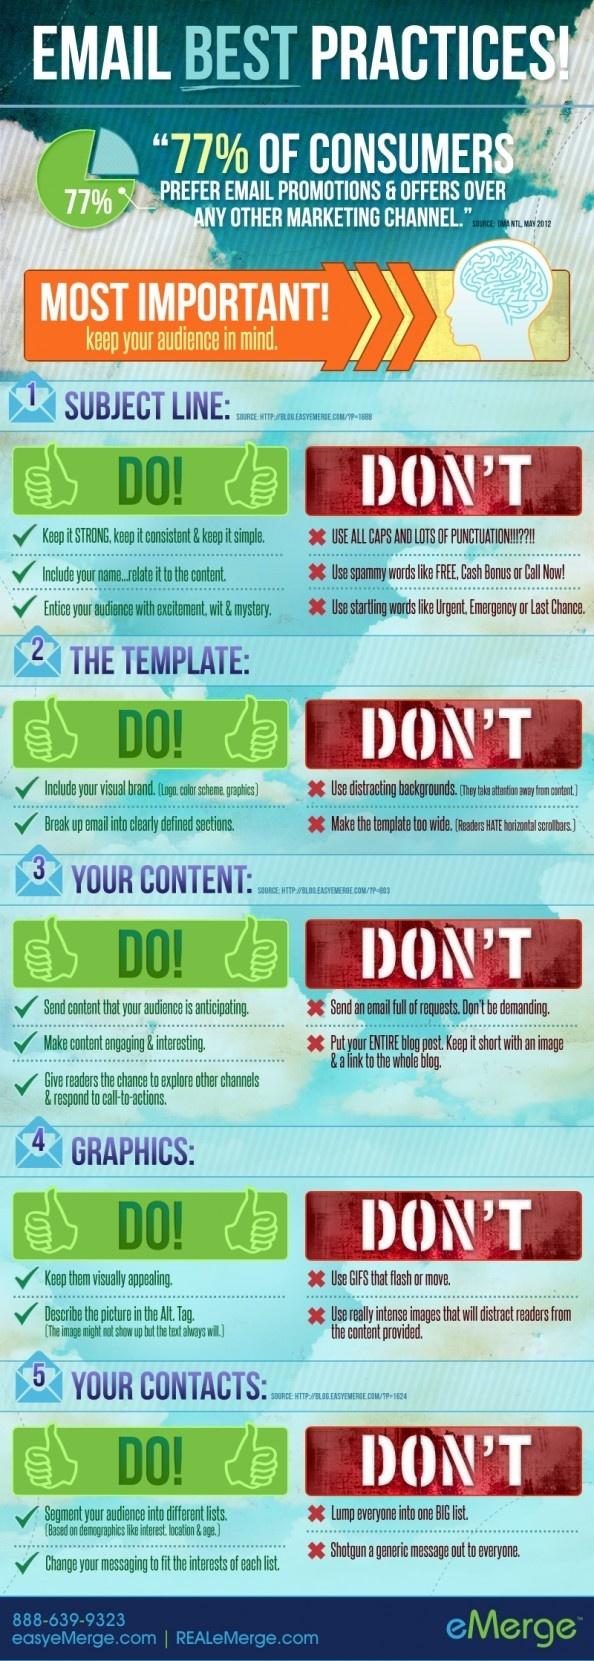 11 best Email Marketing Best Practices images on Pinterest | Digital ...